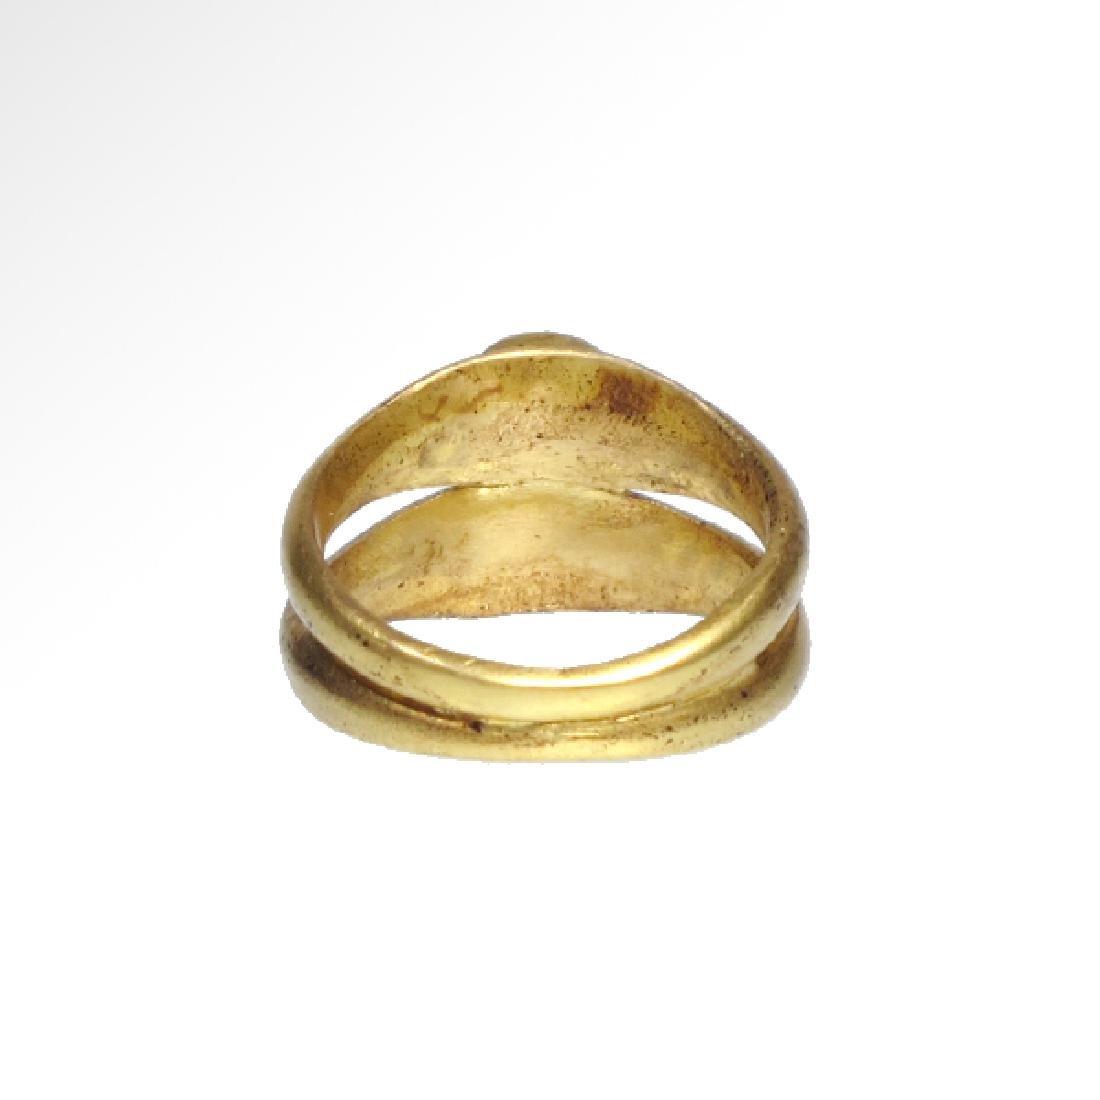 Roman Gold Double Ring, Onyx Intaglios, c. 2nd Century - 6